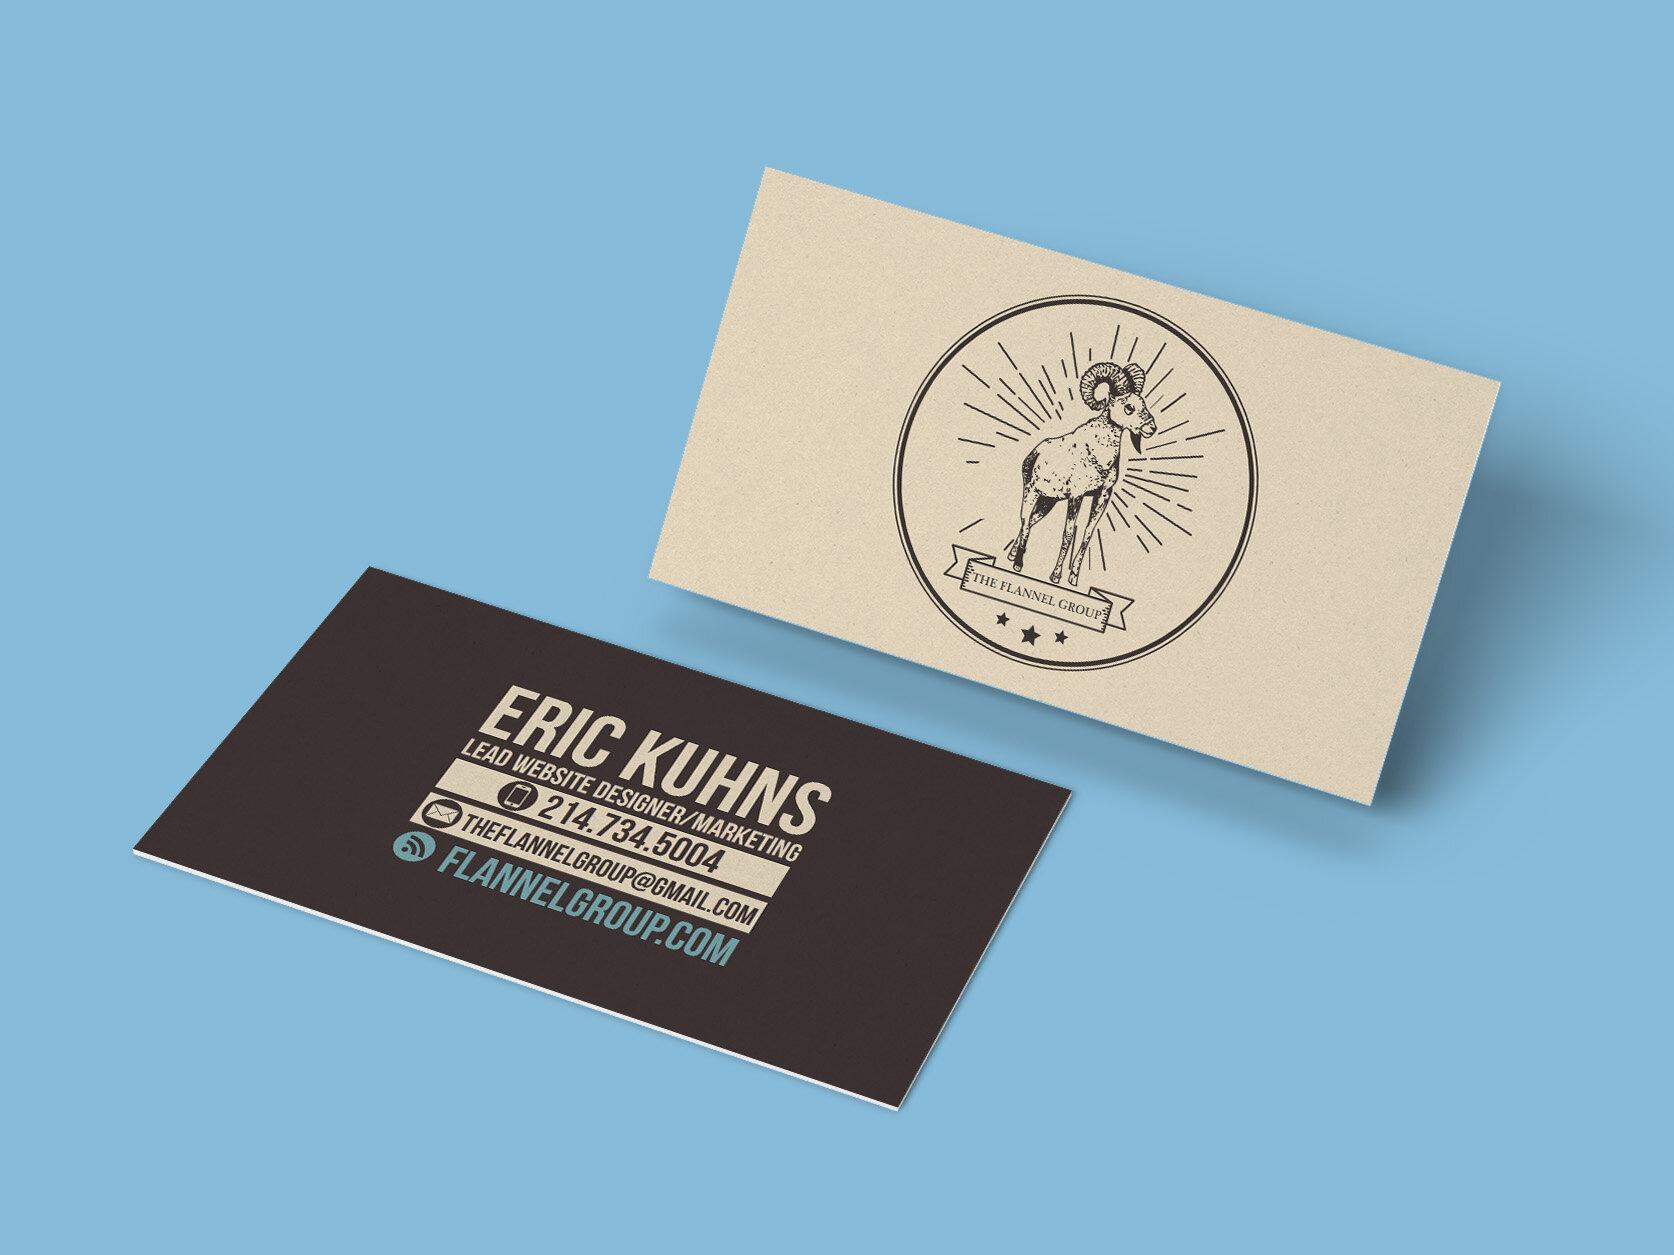 Eric Flannel group Businesscard   2.jpg